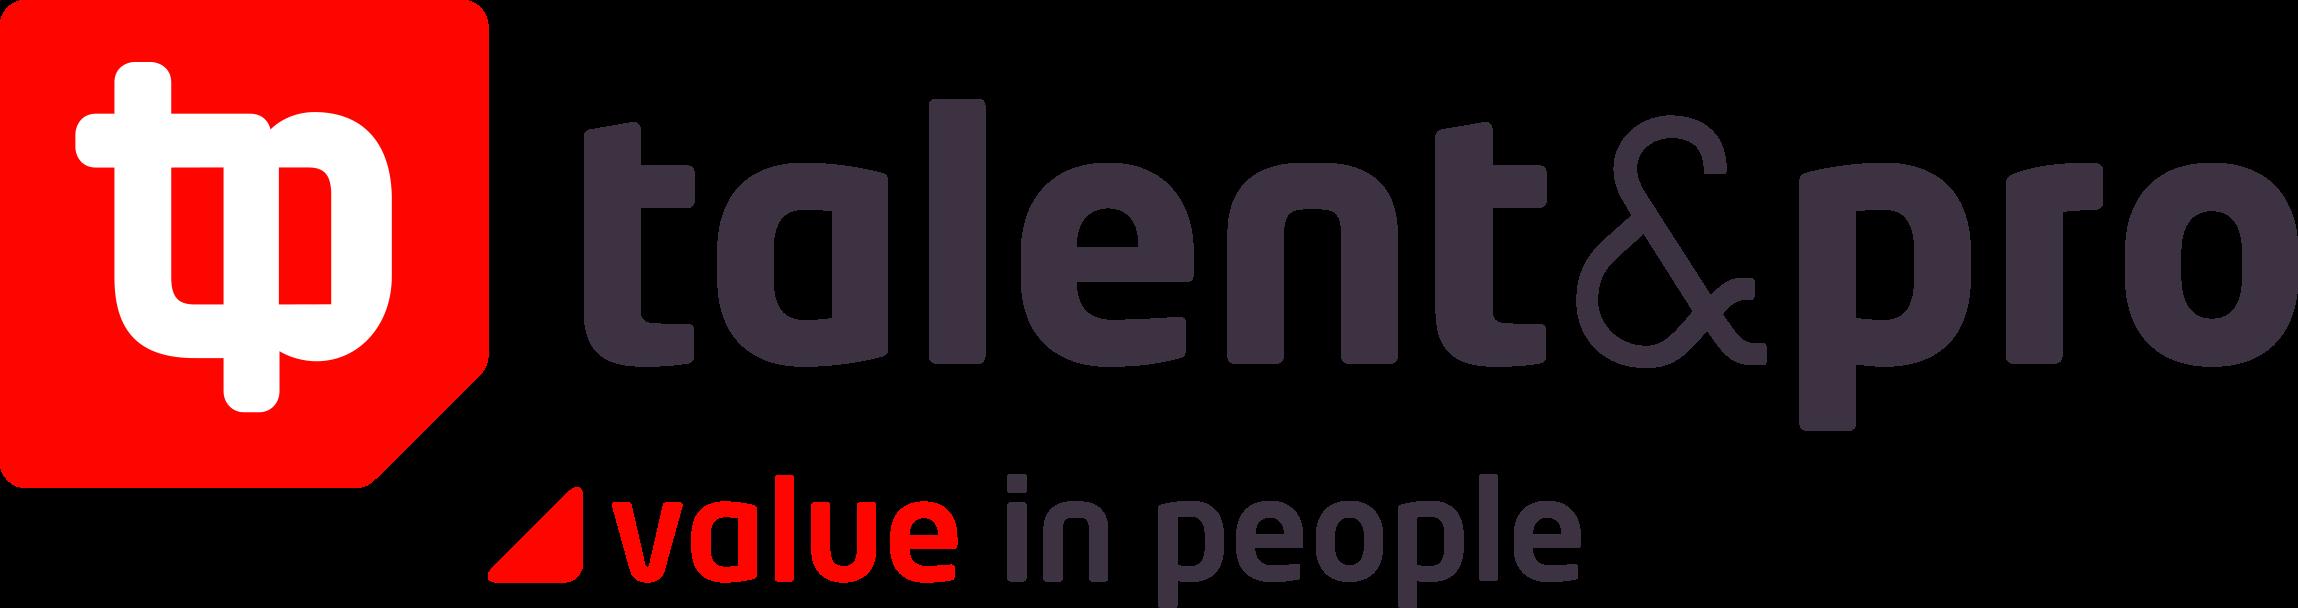 Talent&Pro logo